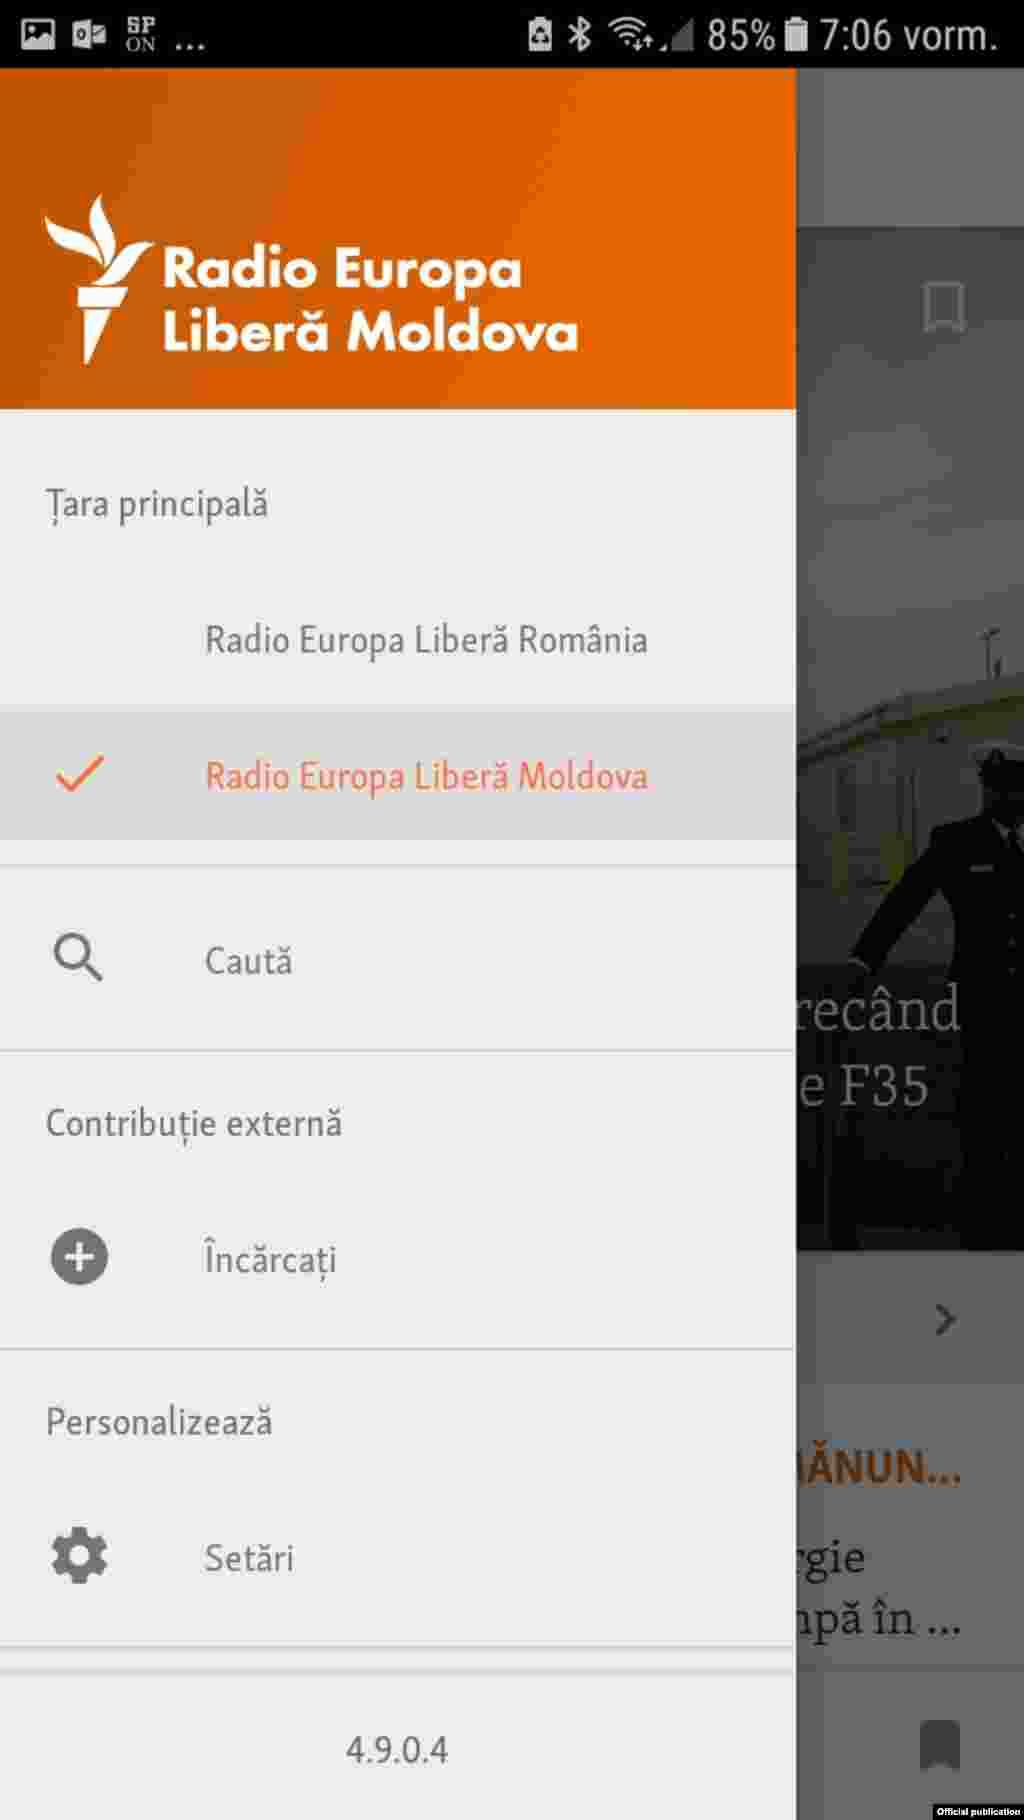 Moldova - aplciatie mobil 2 2019